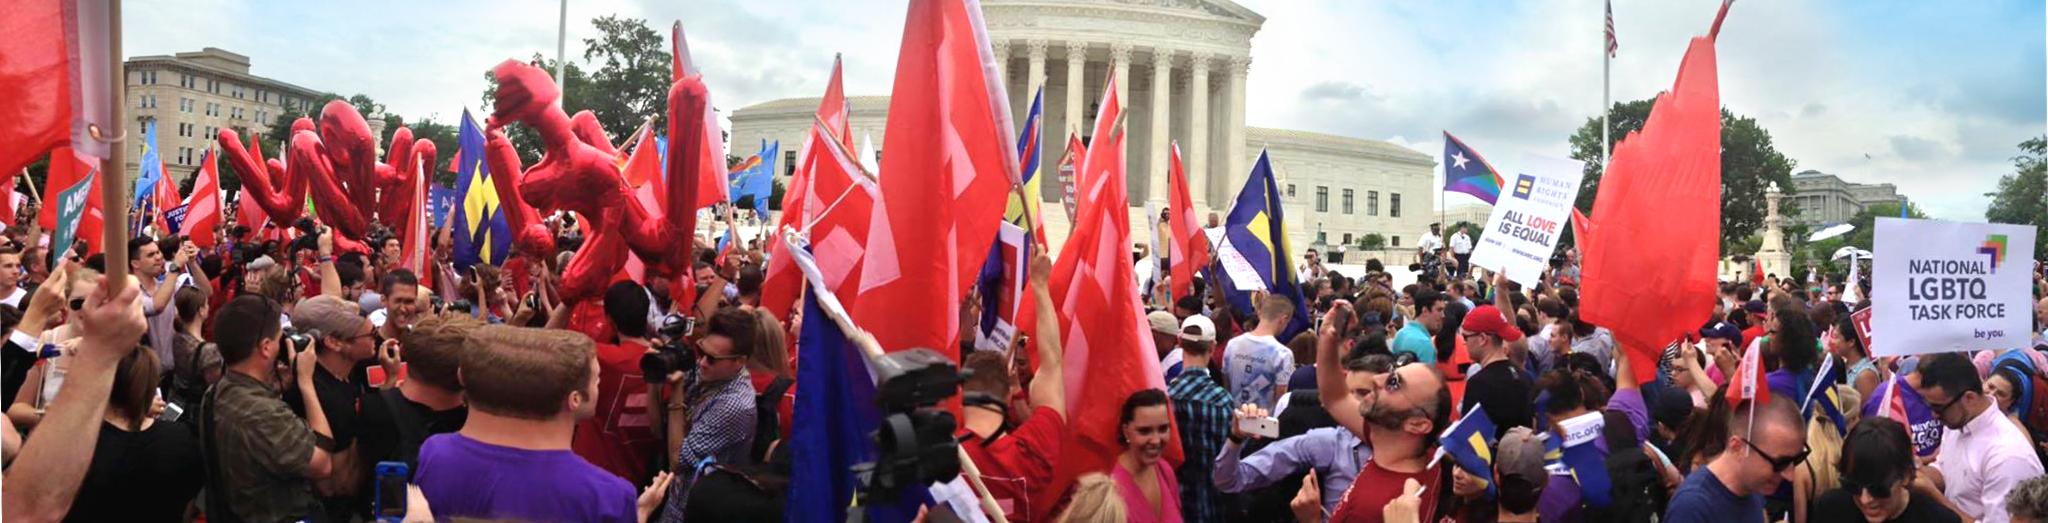 LGBT 2015 USA